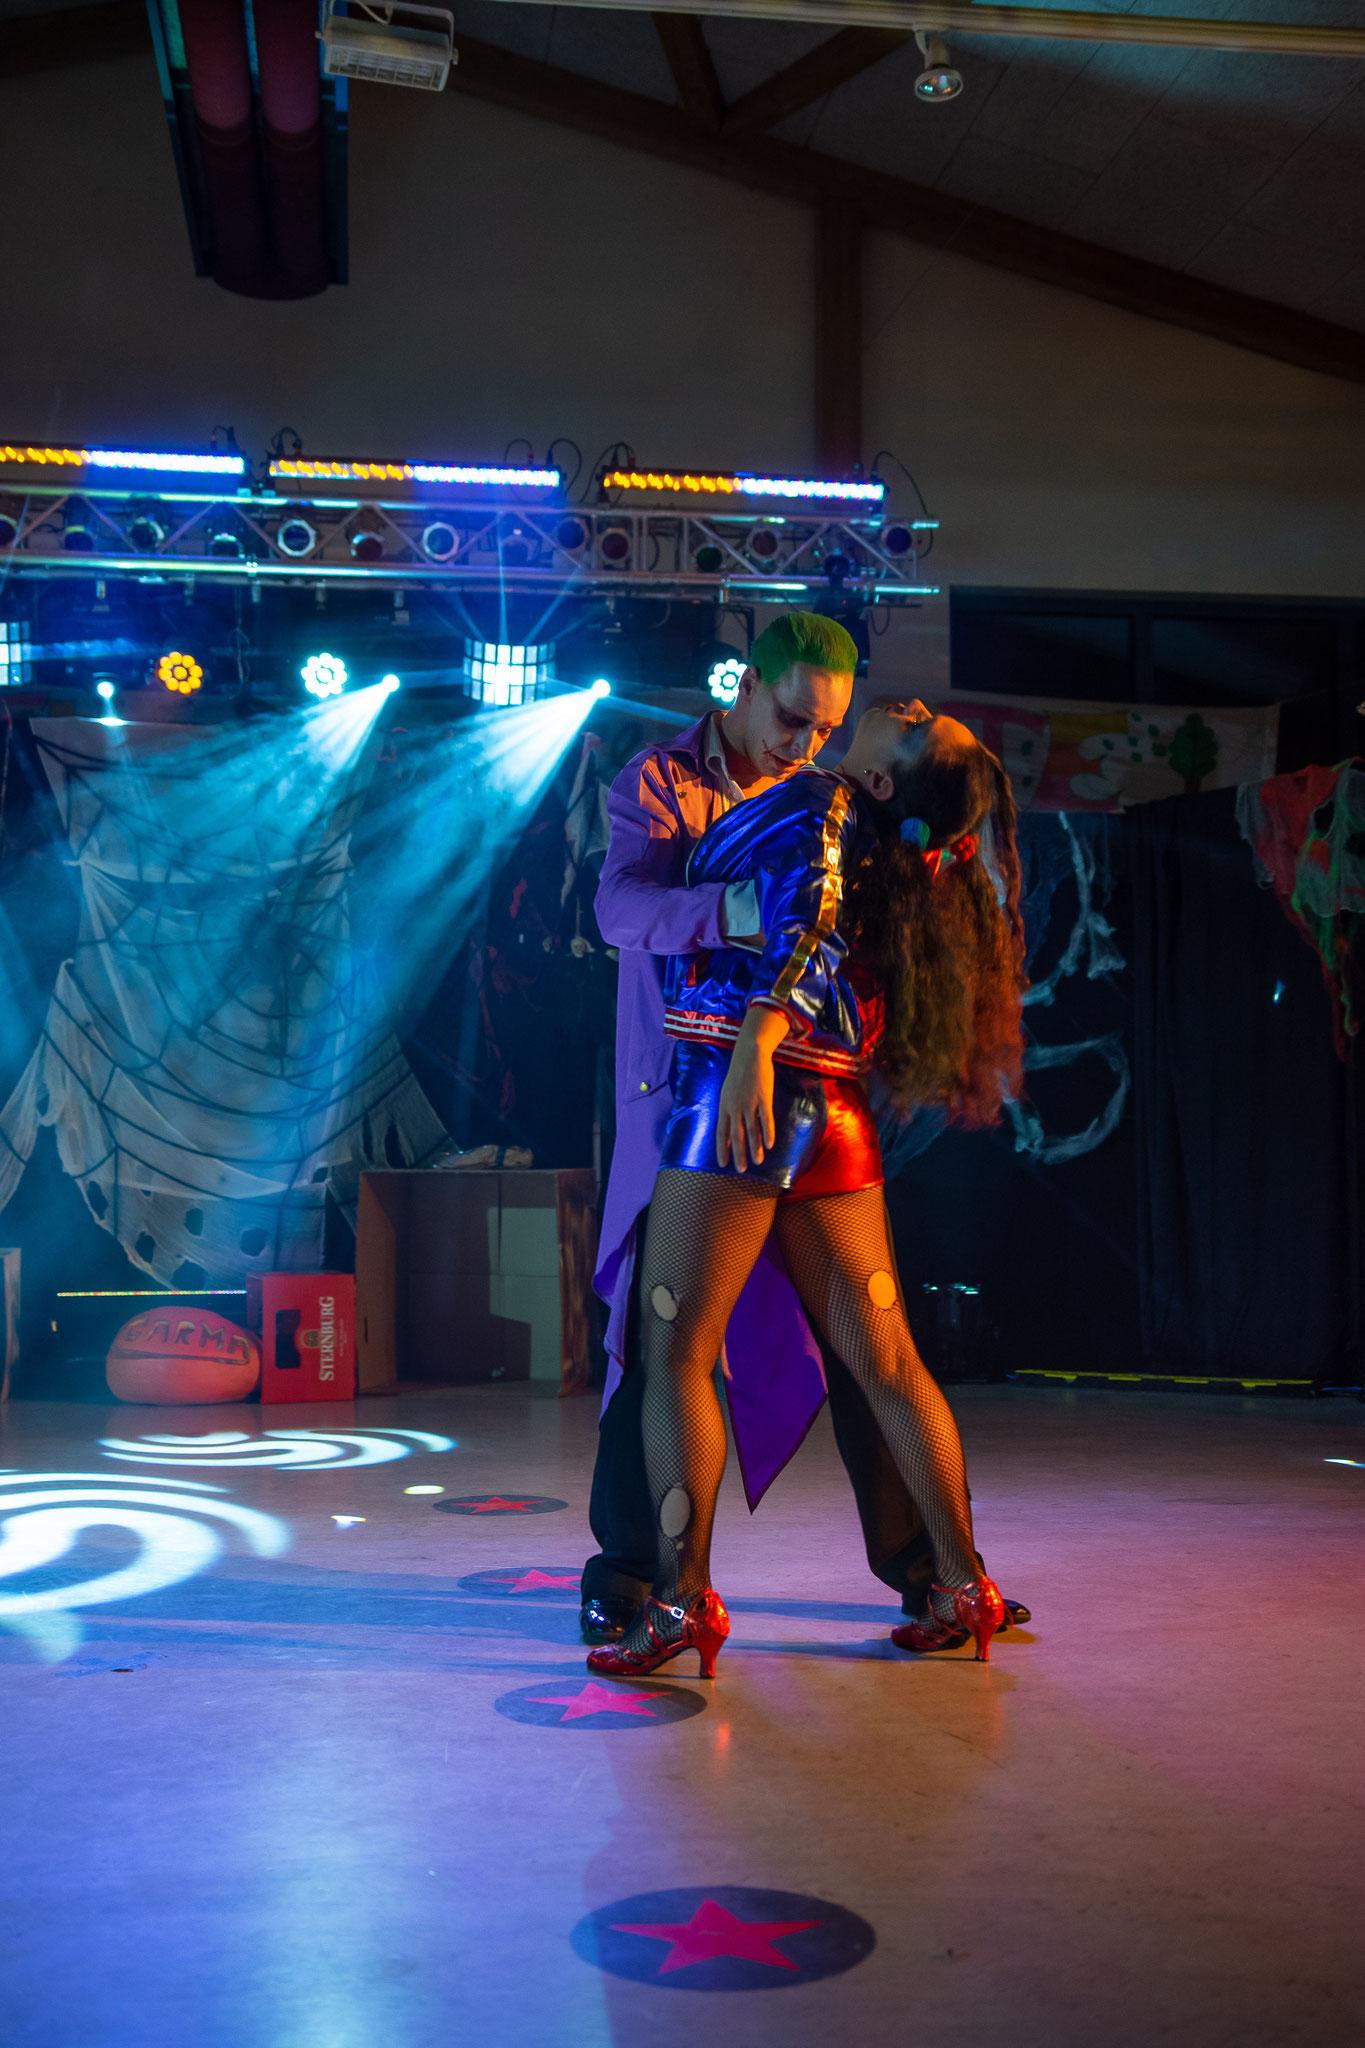 Tanzstudio Bailamos - Liset & Rico